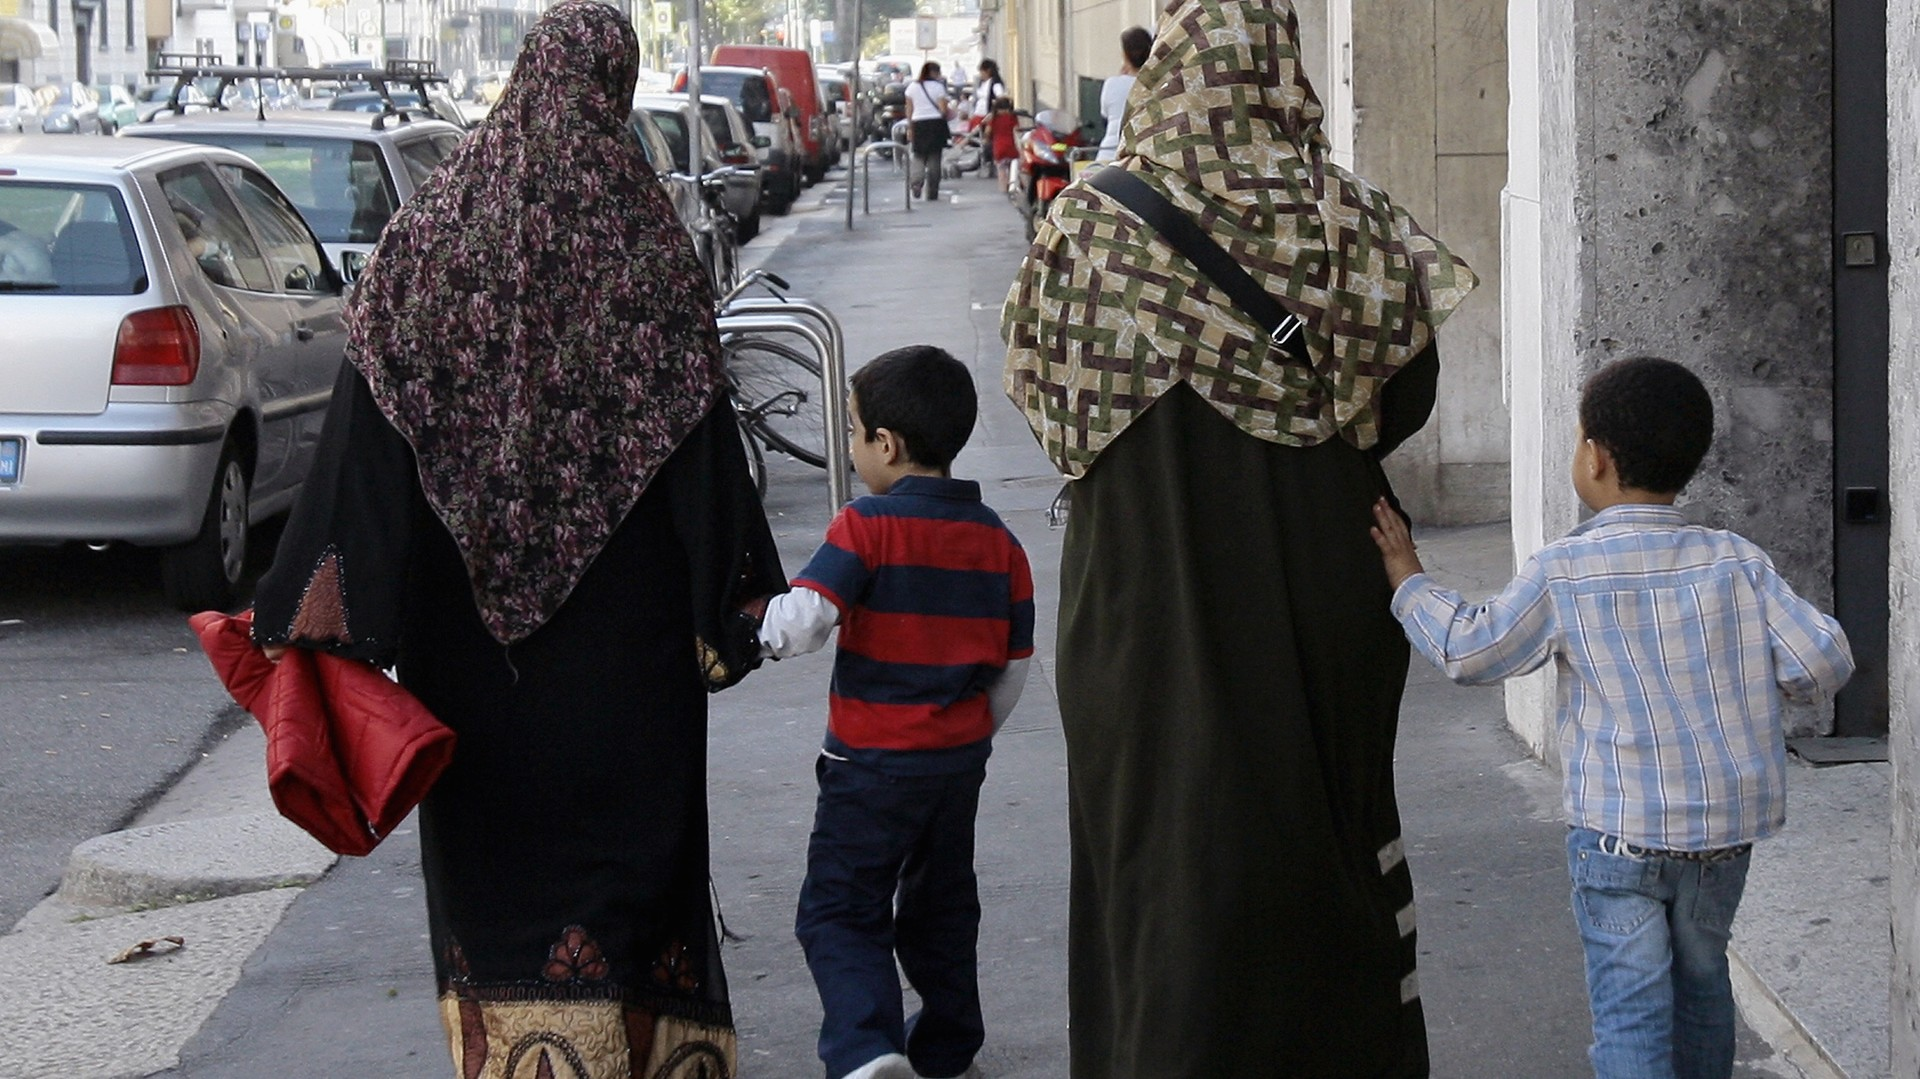 Deux femmes musulmanes dans les rues de Milan